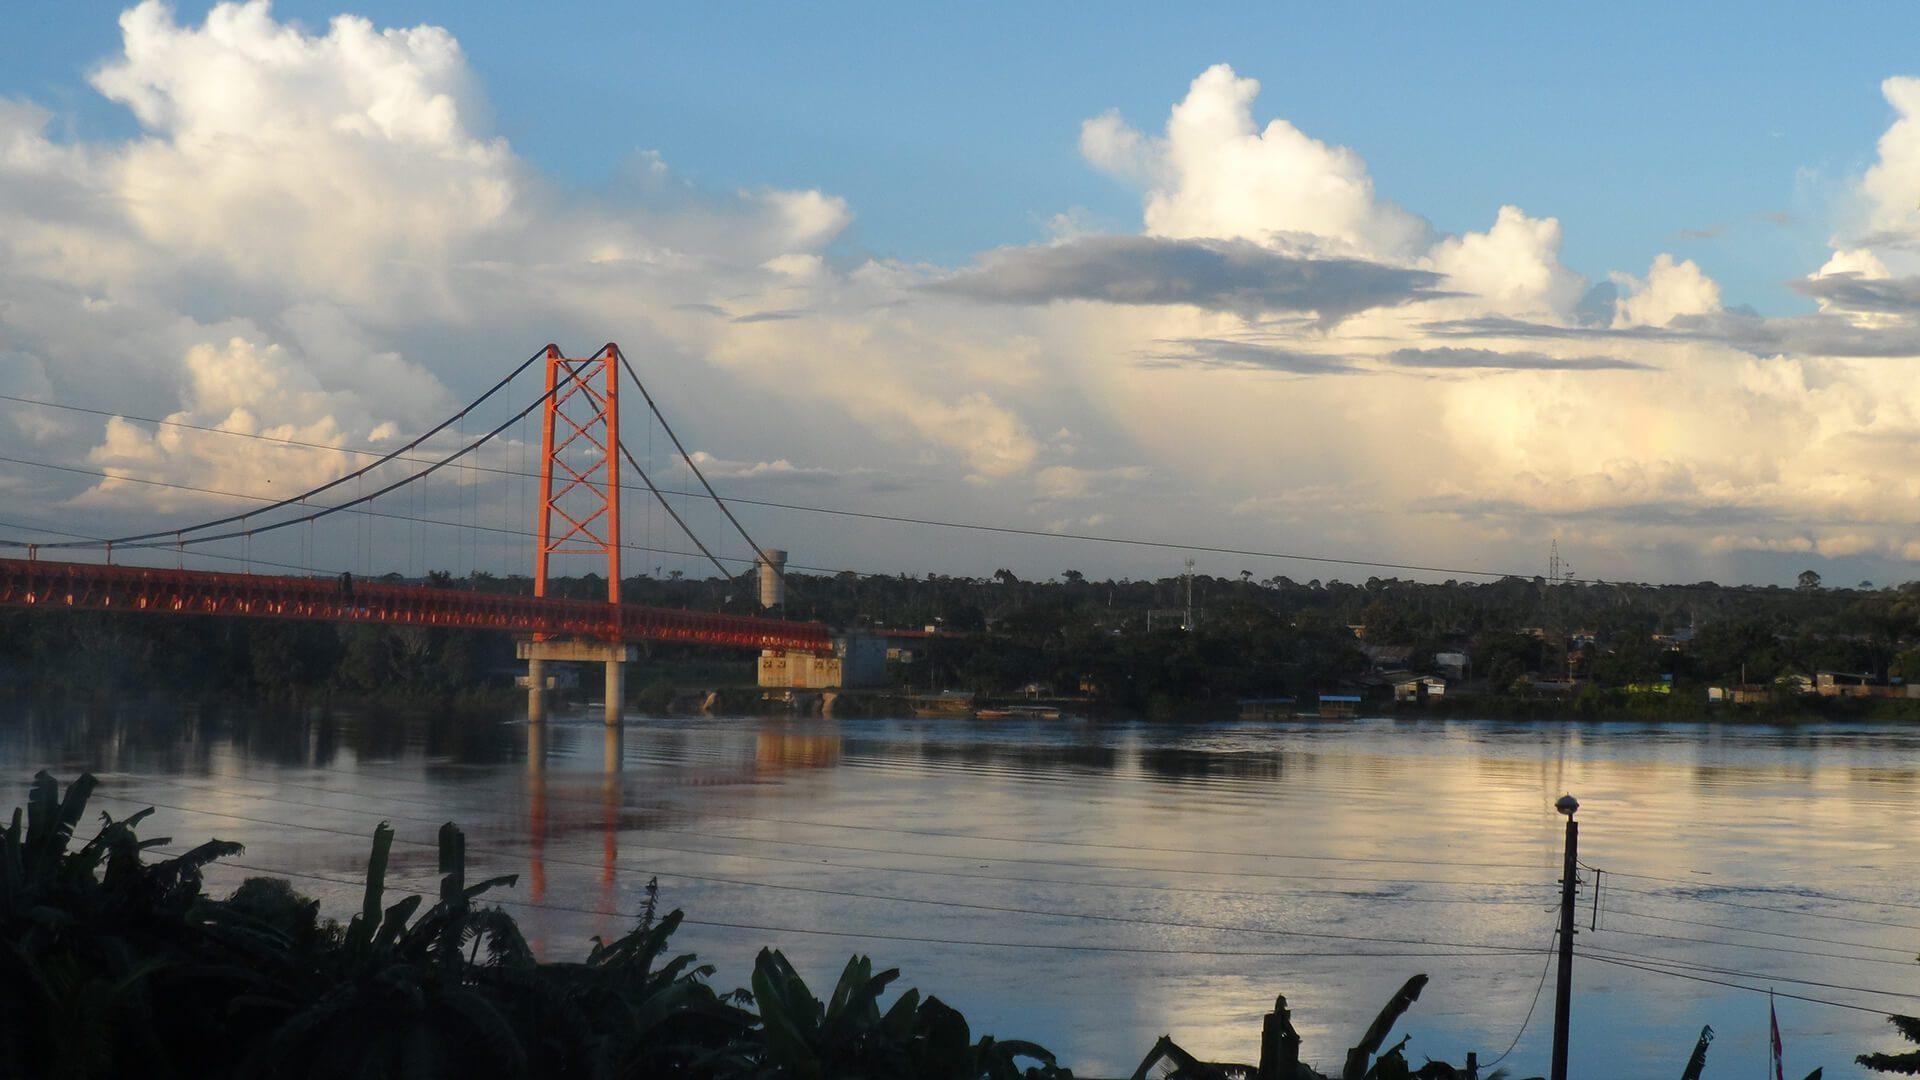 11The Billinghurst bridge is the main way over the Madre de Dios river in Puerto Maldonado | Responsible Travel Peru